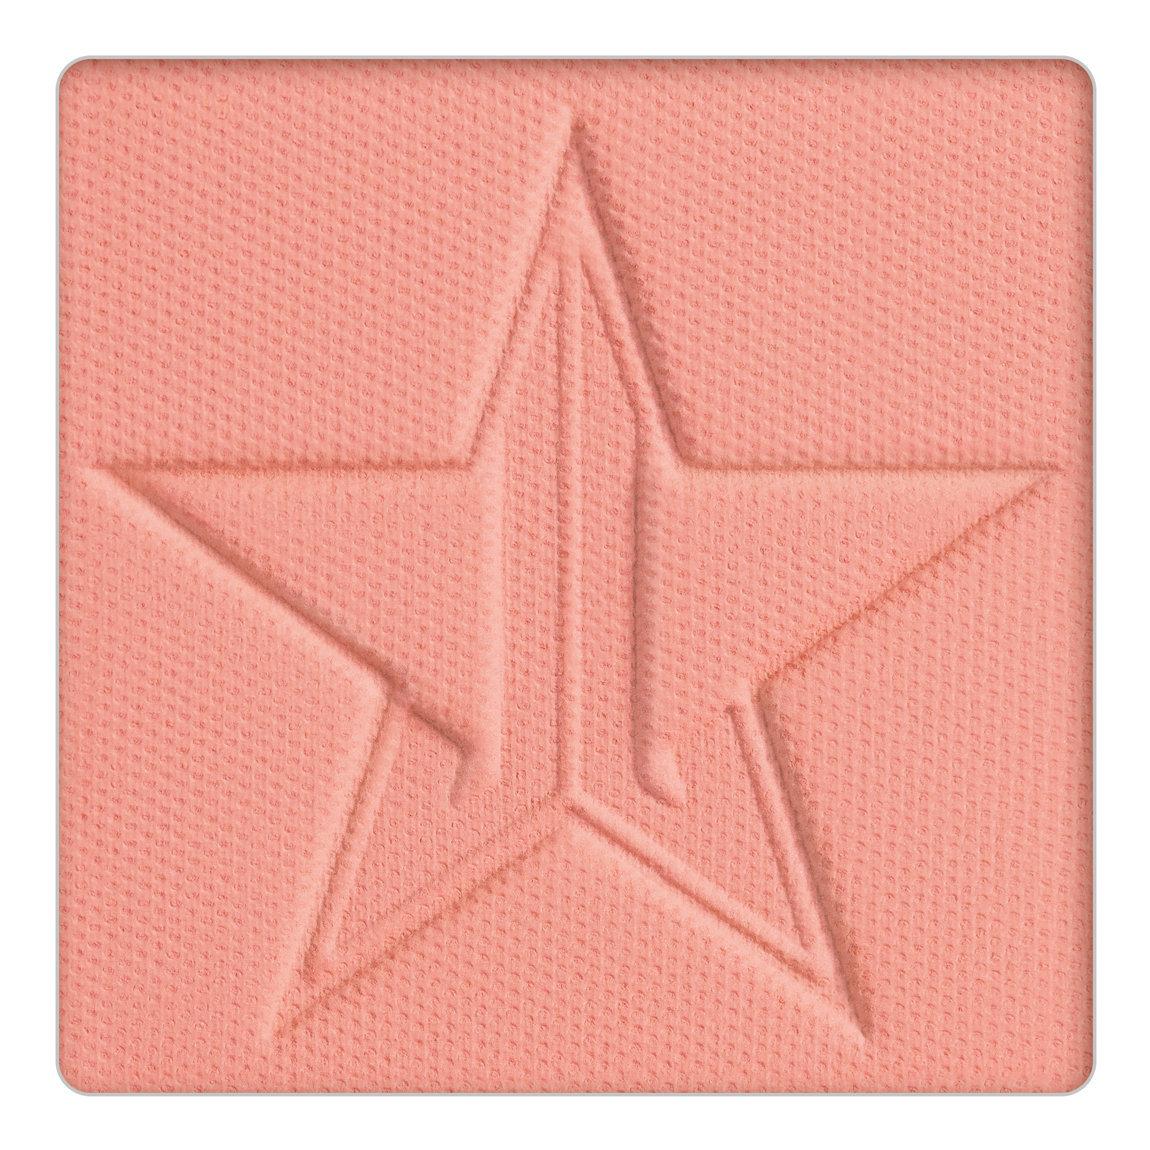 Jeffree Star Cosmetics Artistry Singles Tongue Pop alternative view 1.